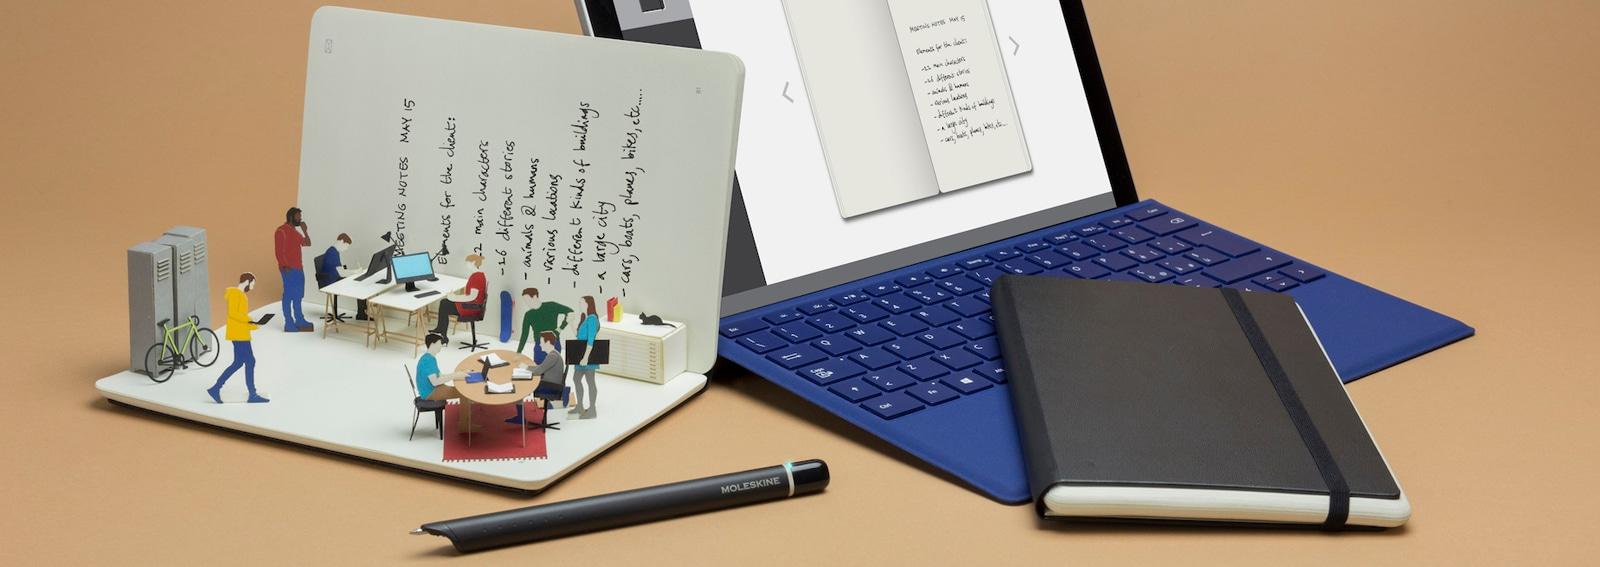 Moleskine Notes App_Windows desktop